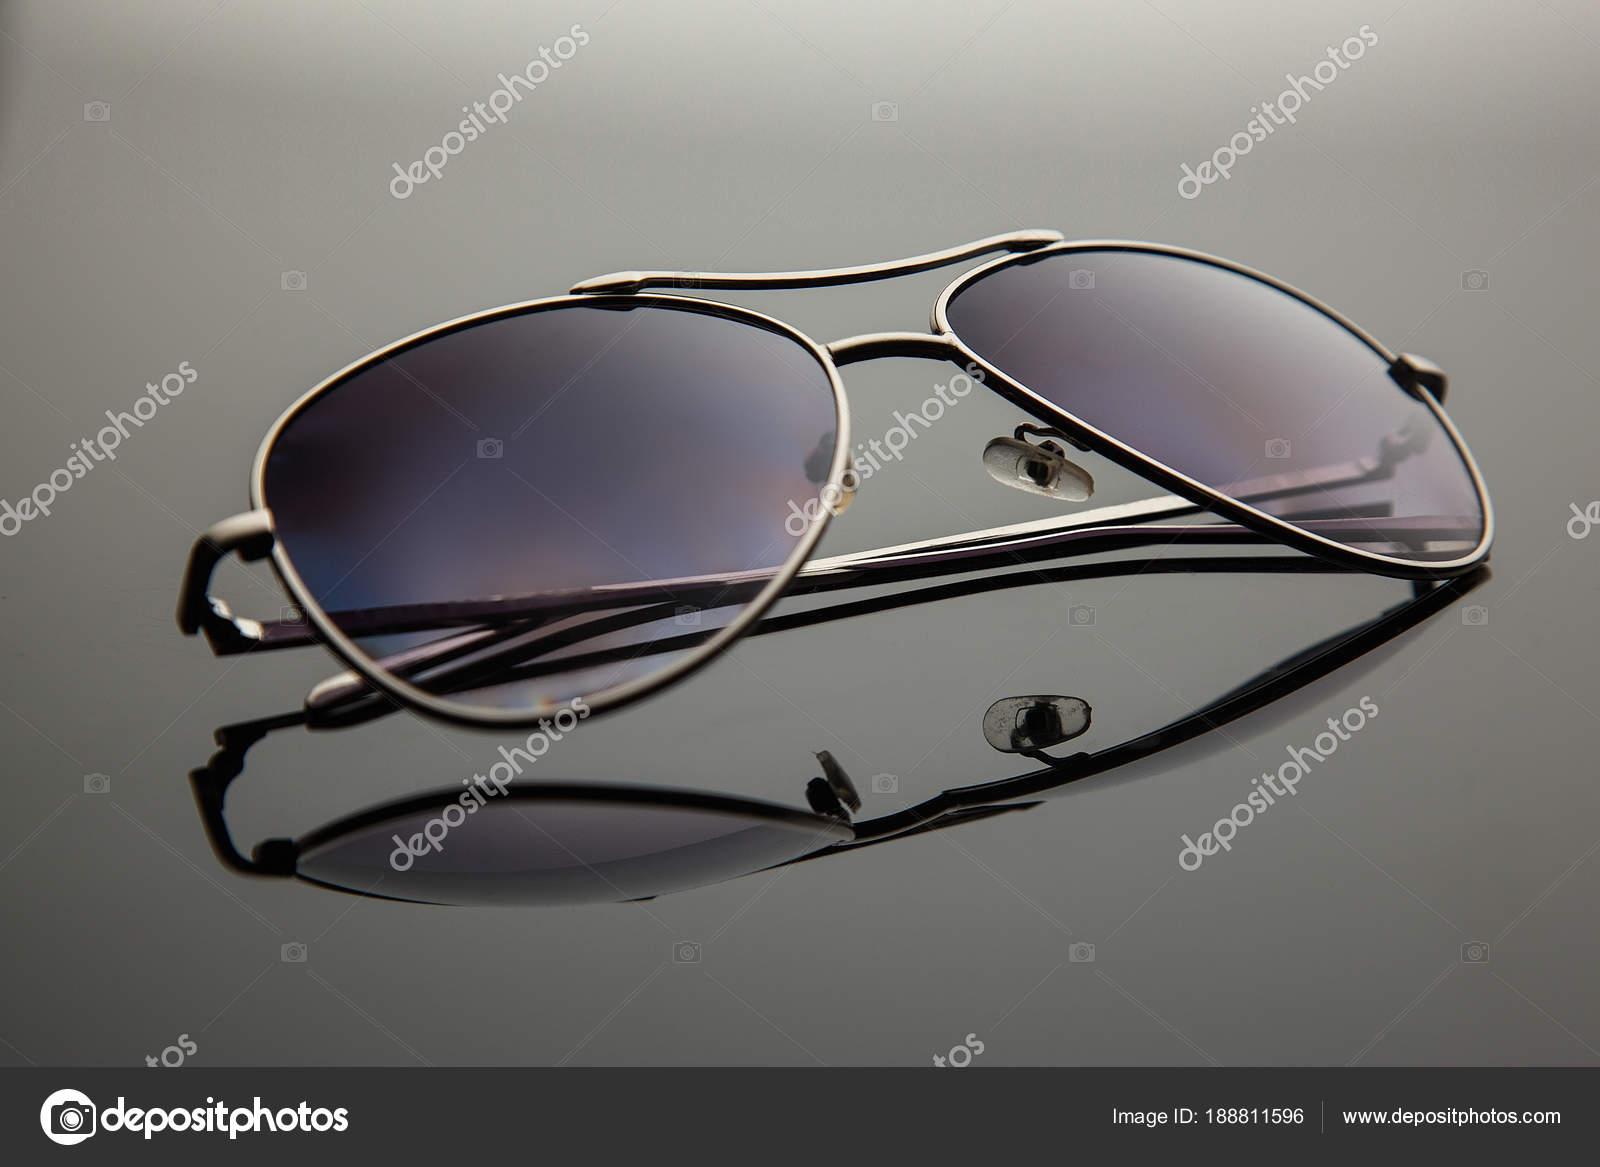 df1641c38a Γυαλιά ηλίου γυαλιά μορφή πτώση